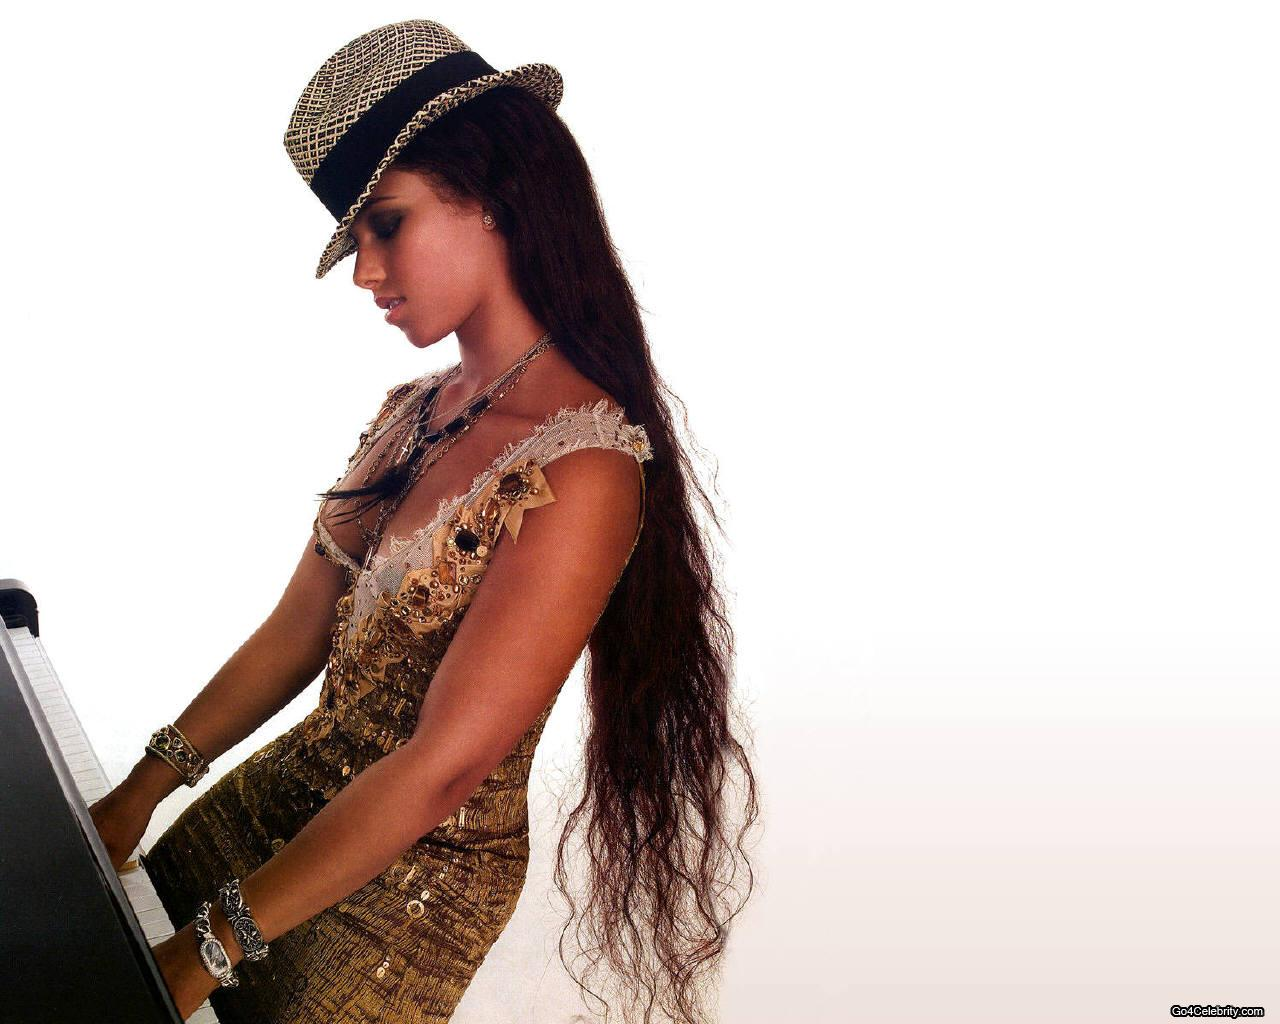 http://2.bp.blogspot.com/-04DUalVIaWw/TscLVu6aRHI/AAAAAAAAAik/34GsQsRhN7o/s1600/alicia-keys-wallpaper-2-713940.jpg